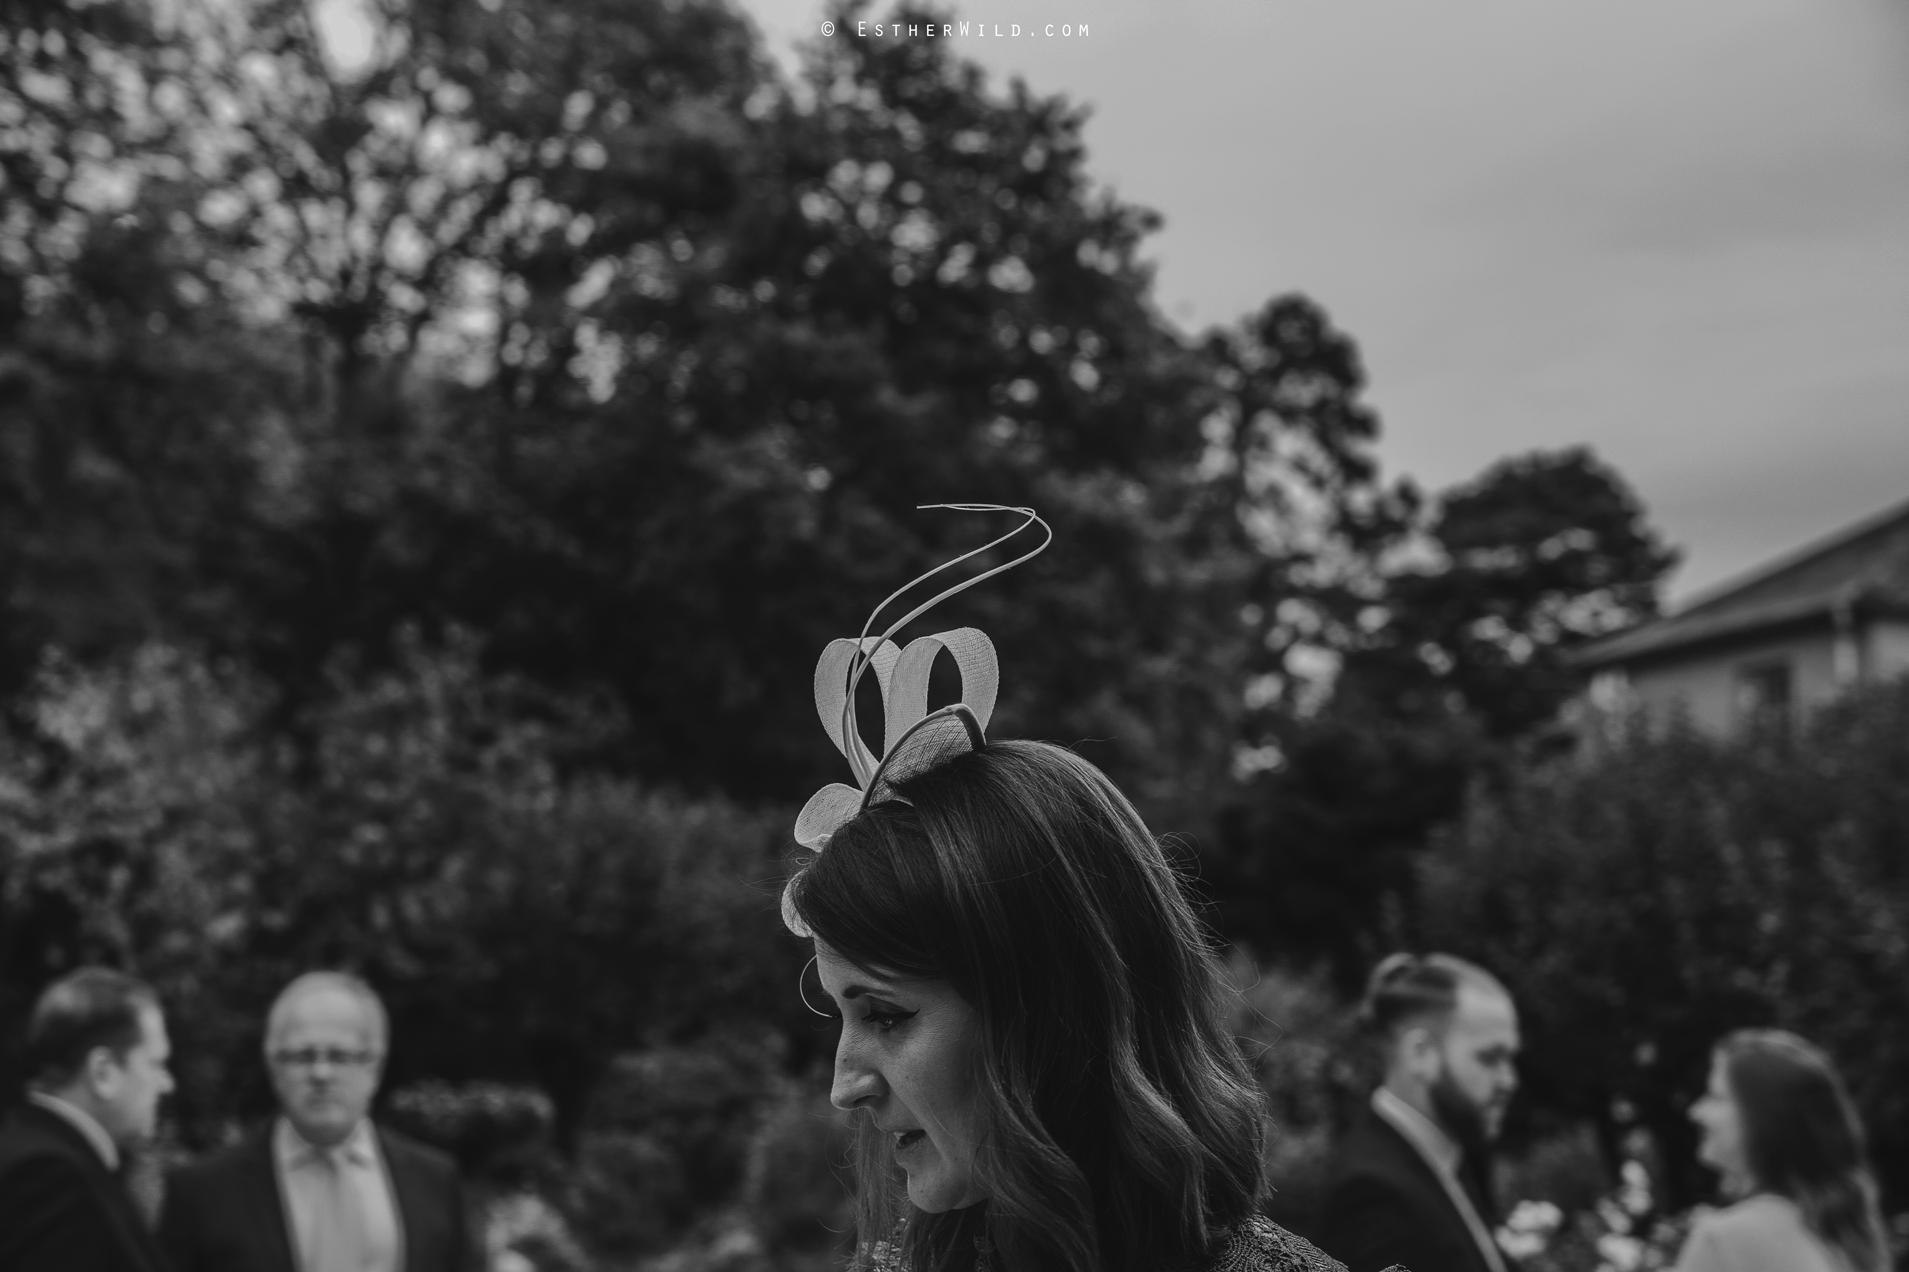 Reading_Room_Weddings_Alby_Norwich_Photographer_Esther_Wild_IMG_1573-1.jpg